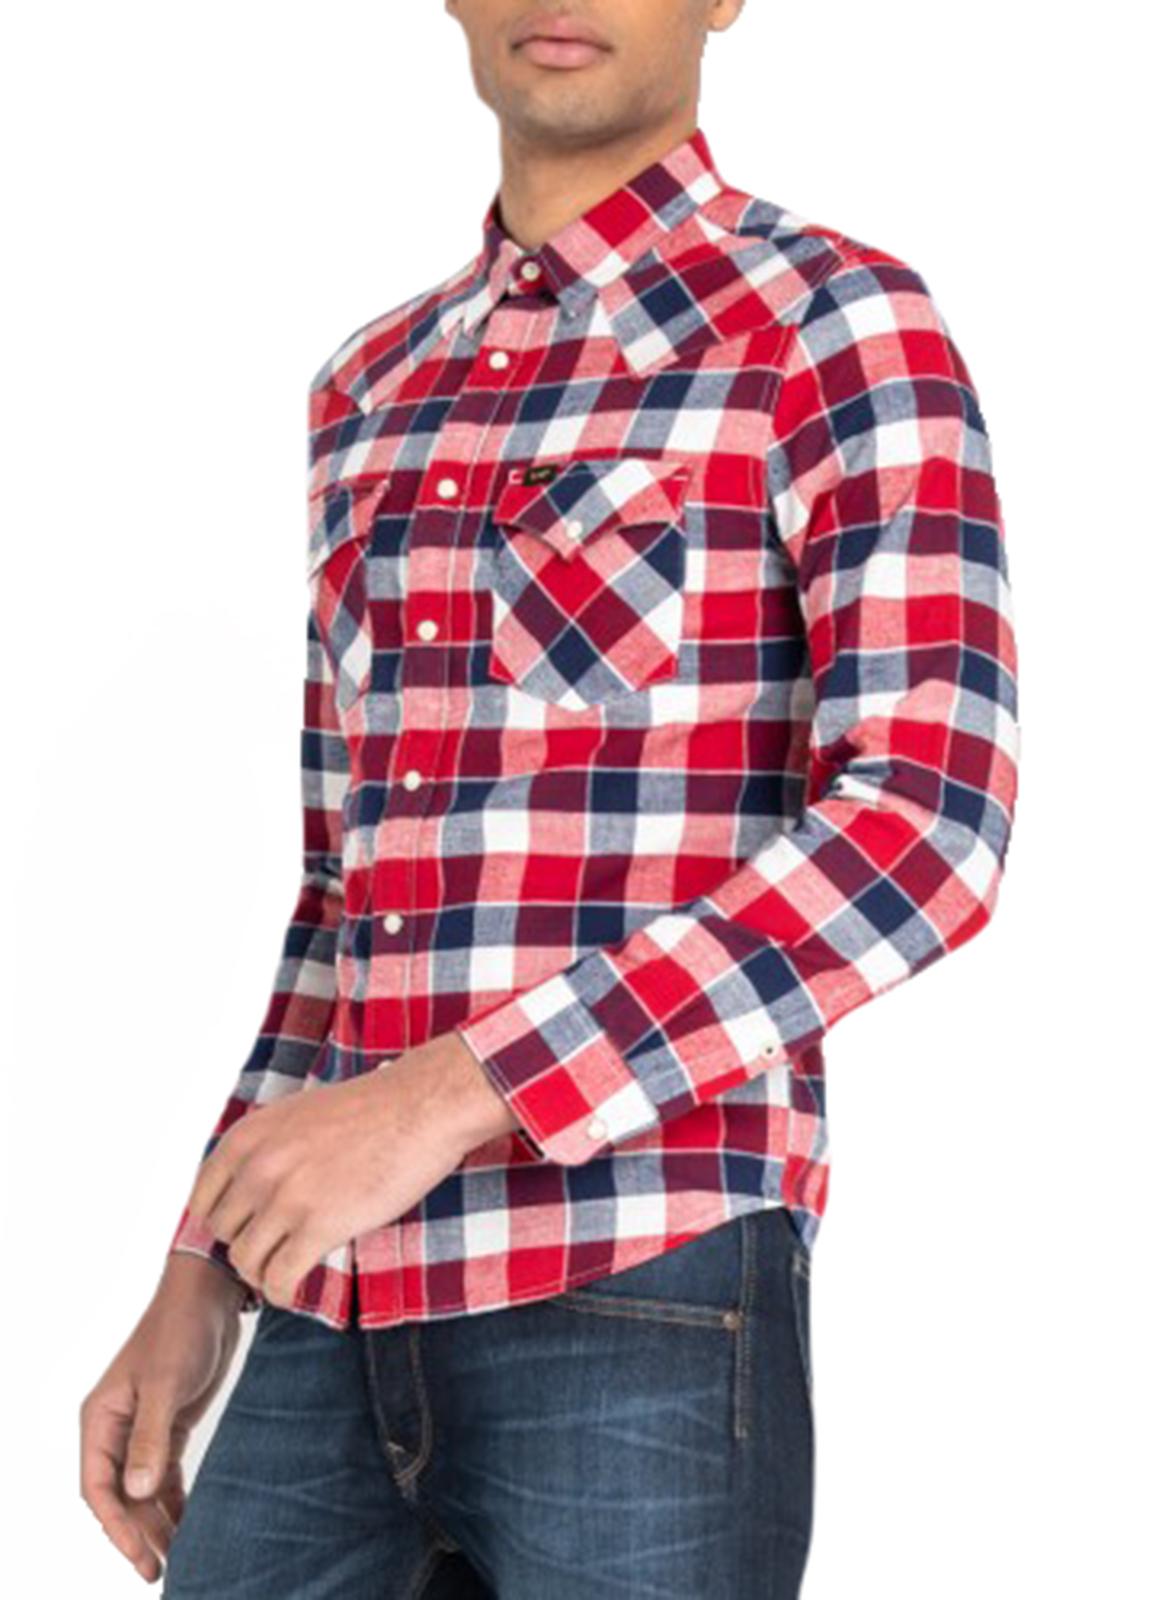 LEE Mens Long Sleeve Cotton Shirt Western Check Slim Fit Bright Red S M L XL XXL